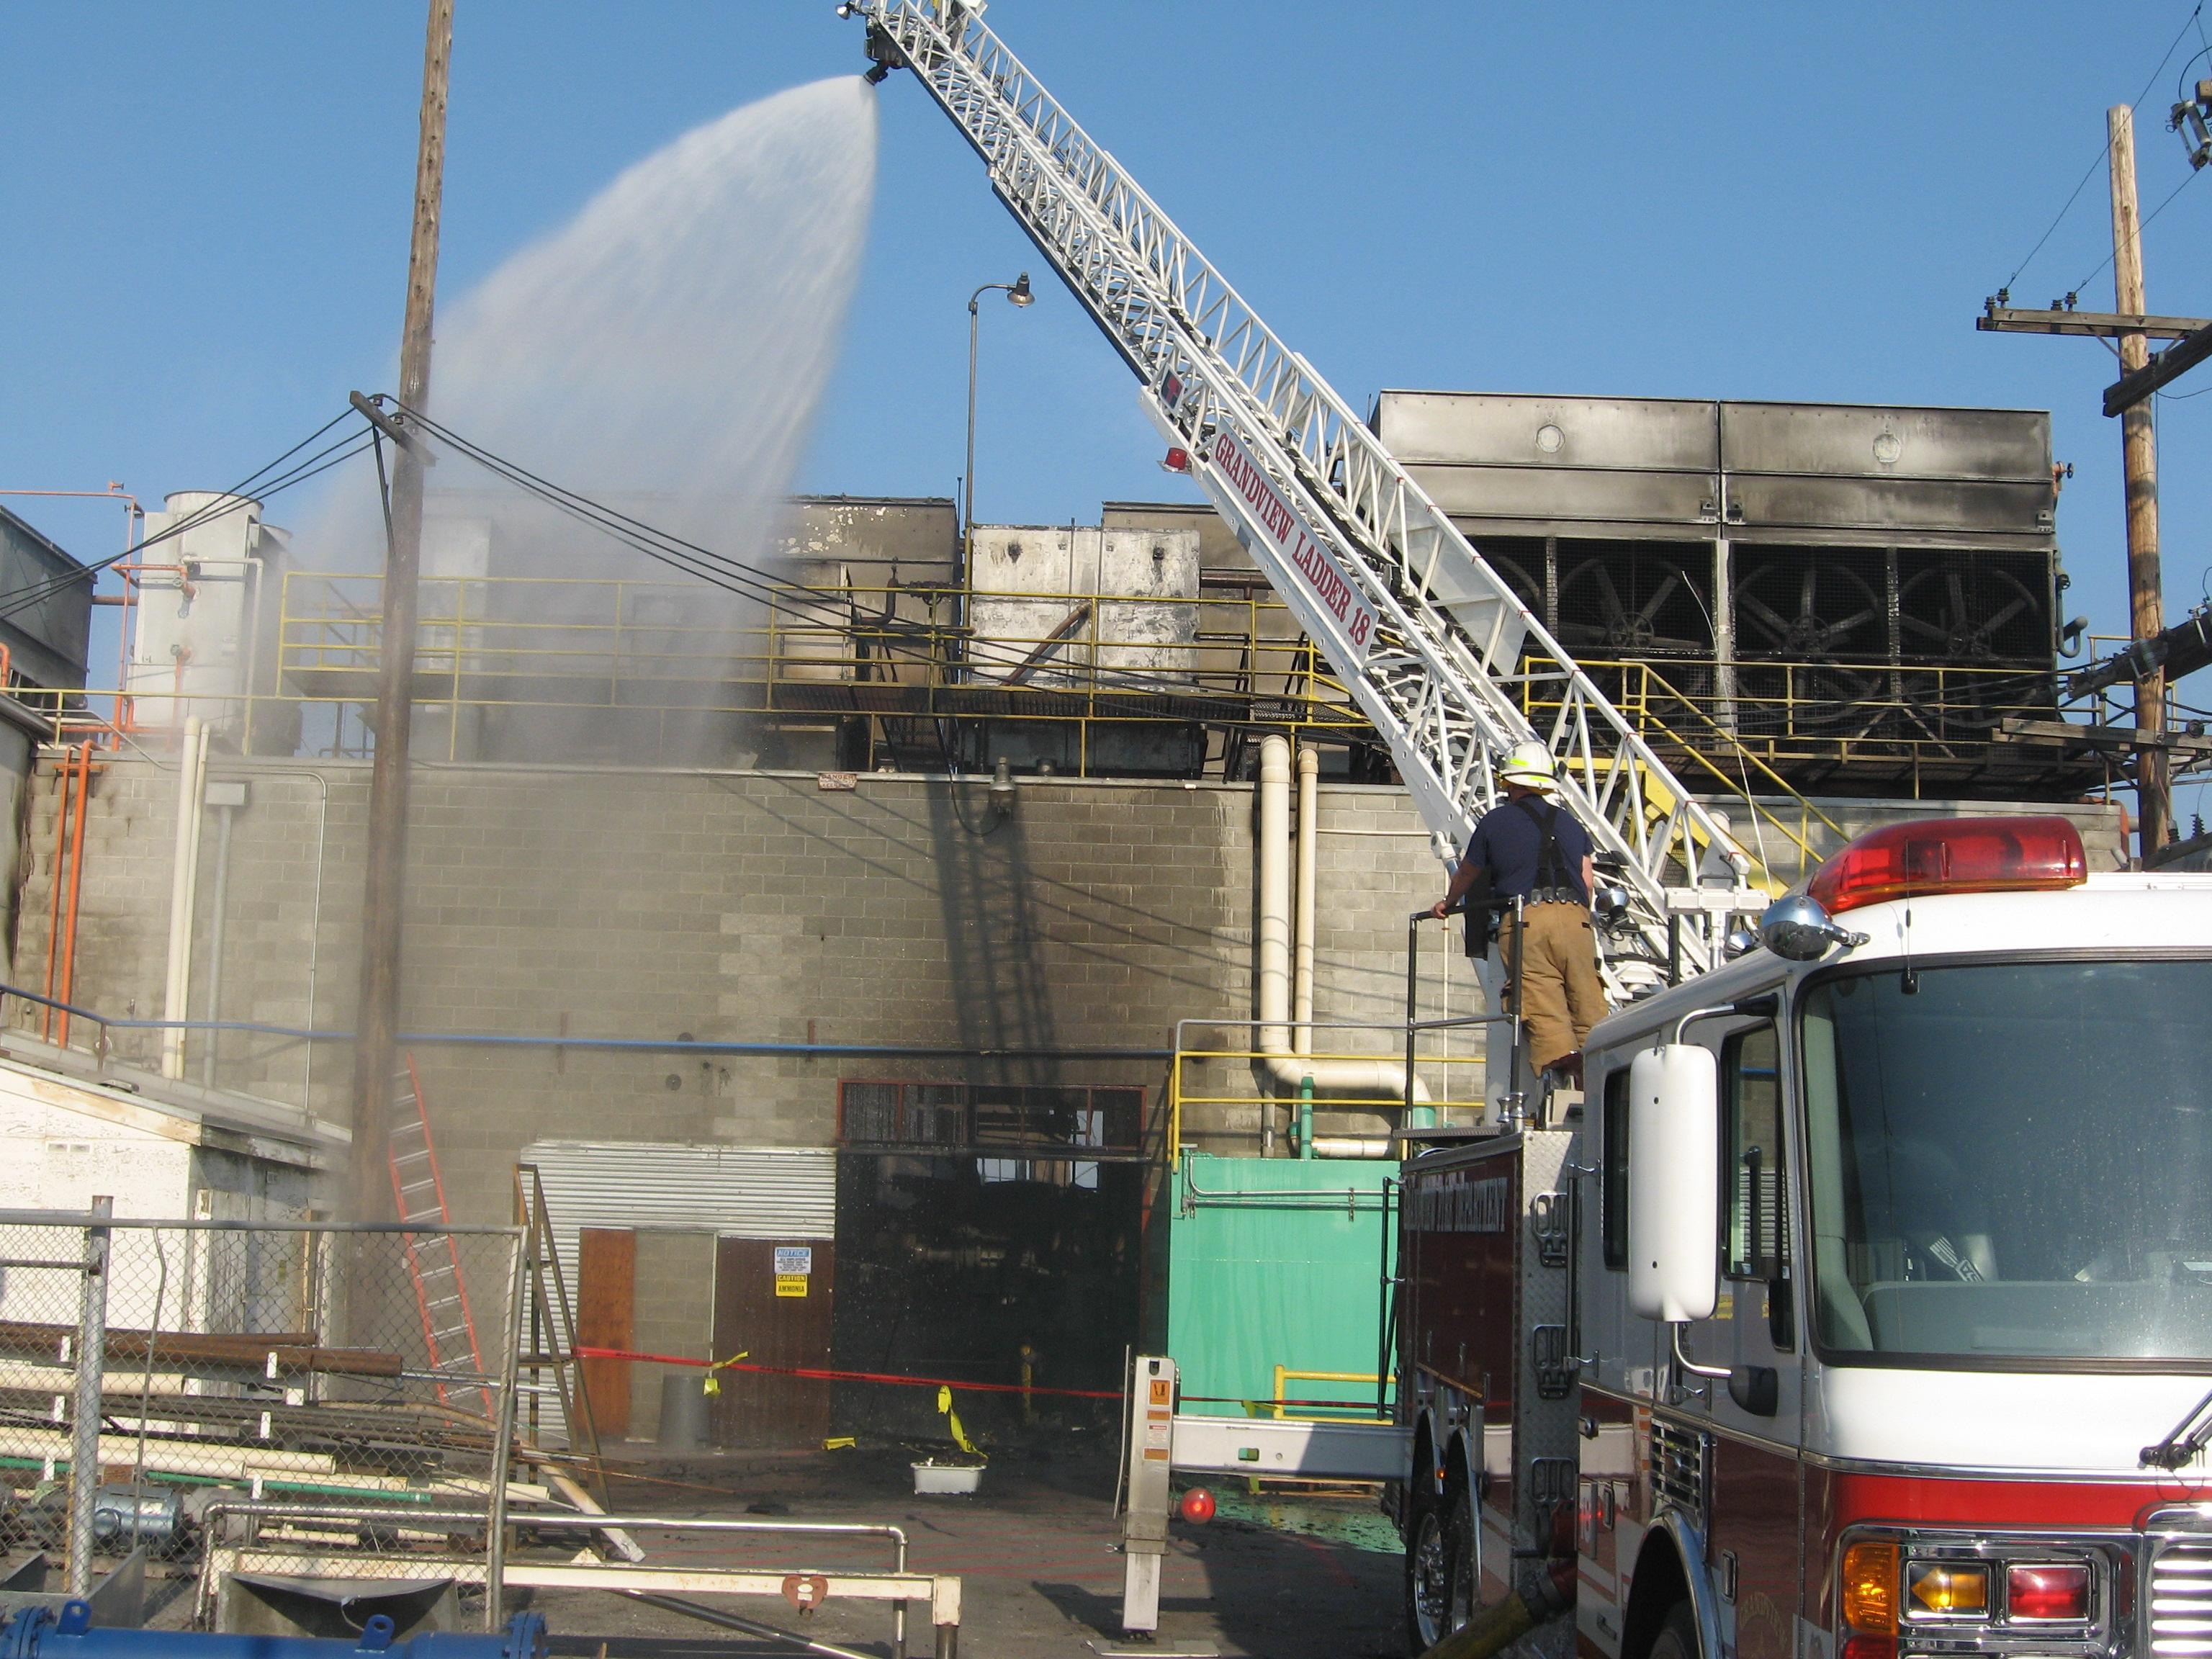 Anhydrous Ammonia Emergency Response | National Response ...